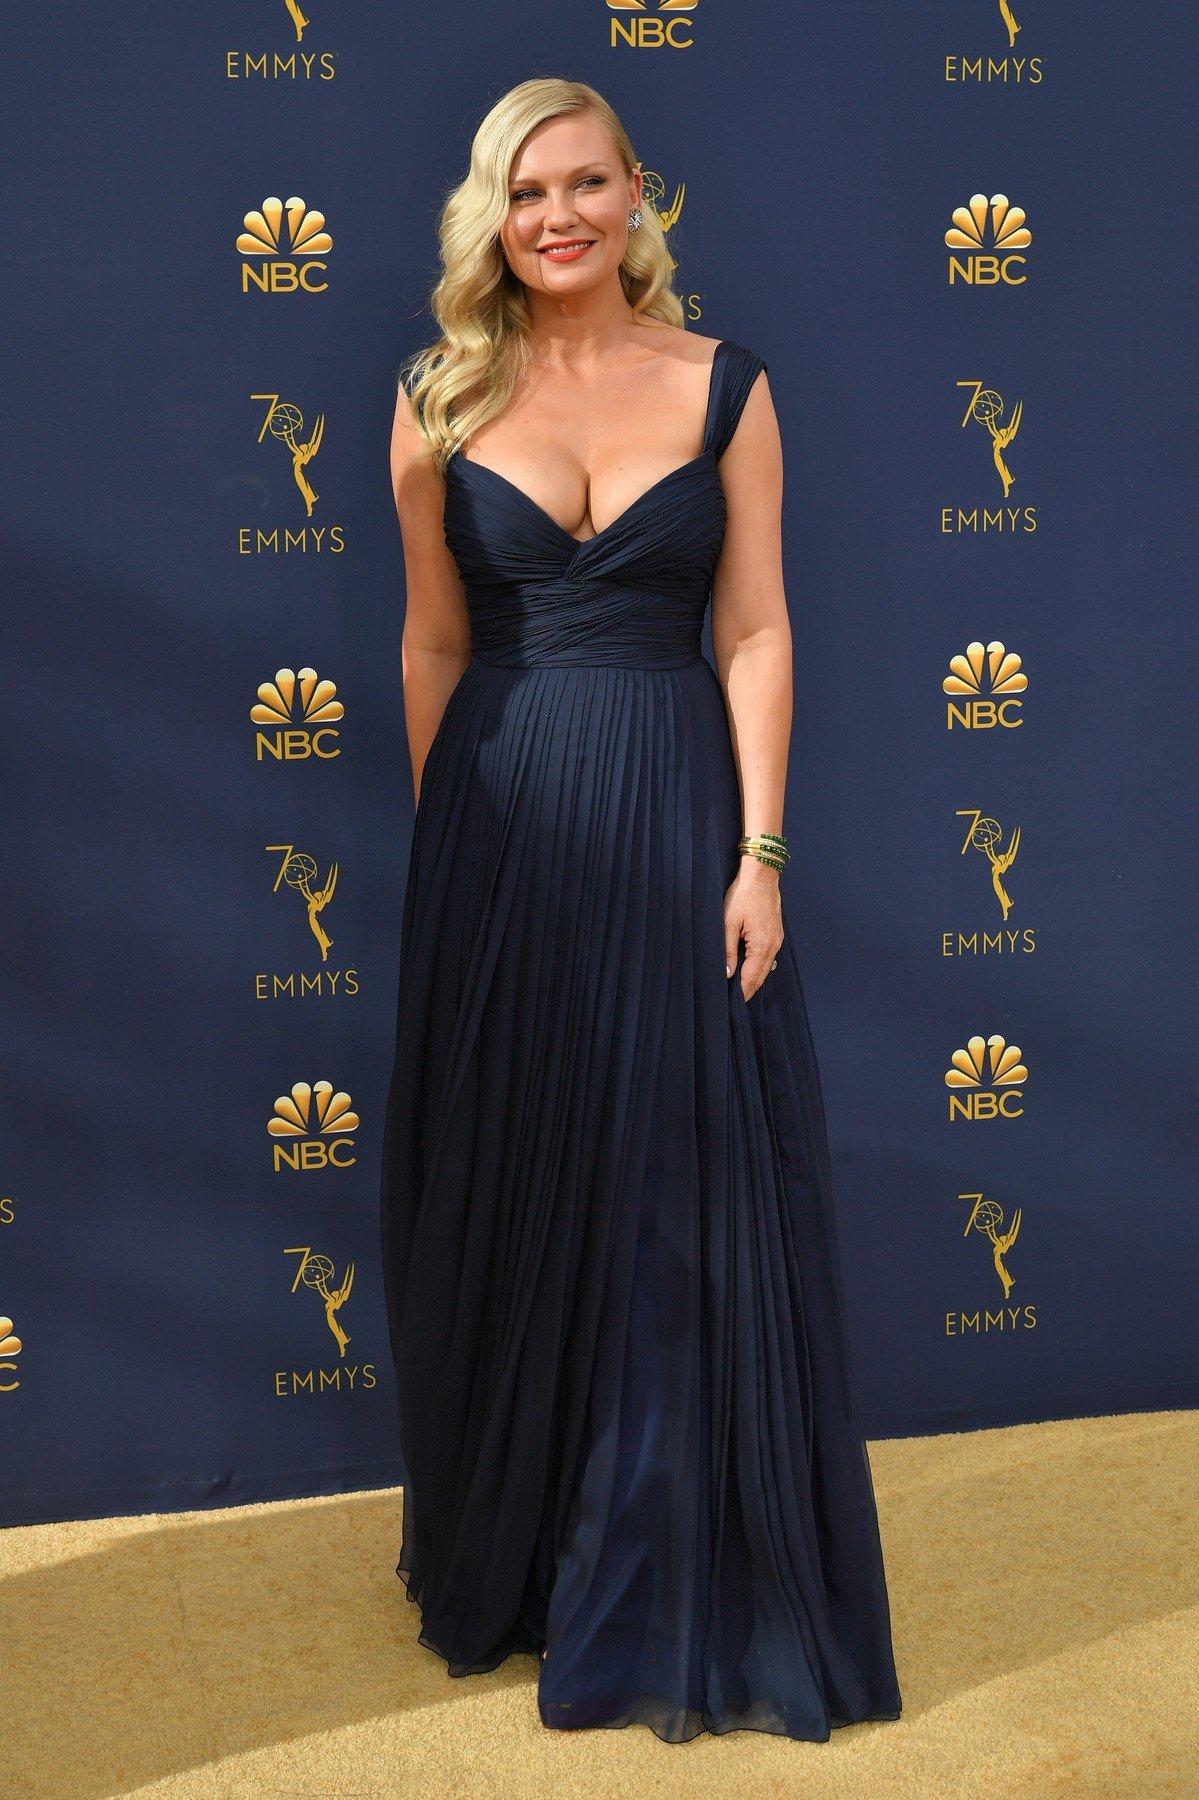 Kirsten Dunst 70th Primetime Emmy Awards, Arrivals, Los Angeles, USA - 17 Sep 2018, Image: 387155284, License: Rights-managed, Restrictions: , Model Release: no, Credit line: Profimedia, TEMP Rex Features